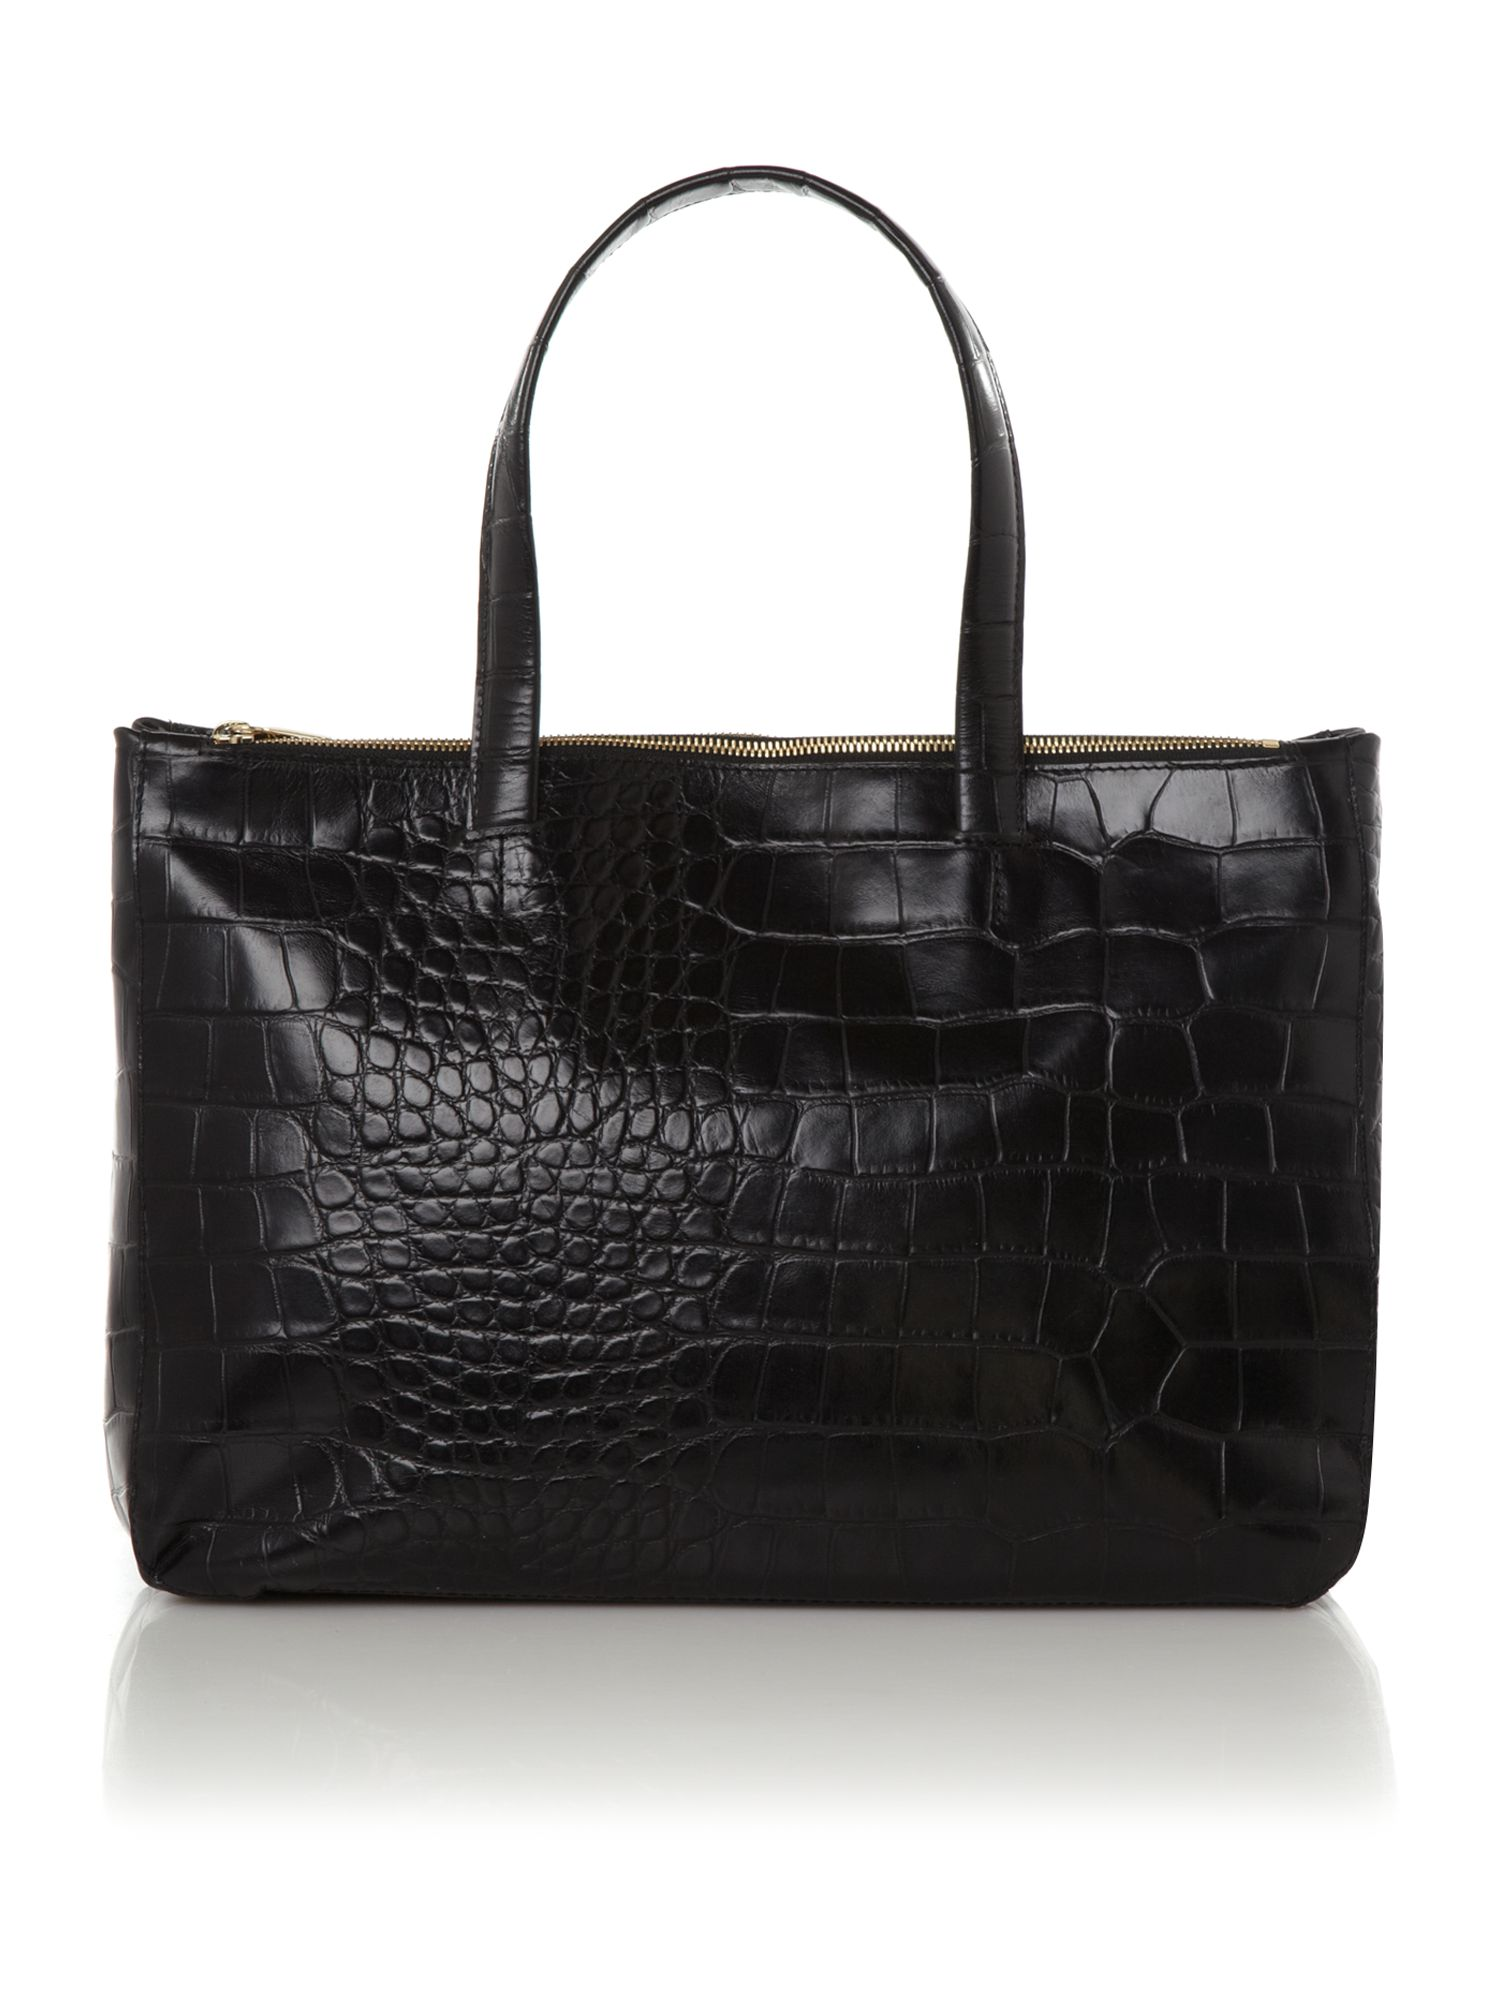 Furla Croc Tote Bag In Black Lyst